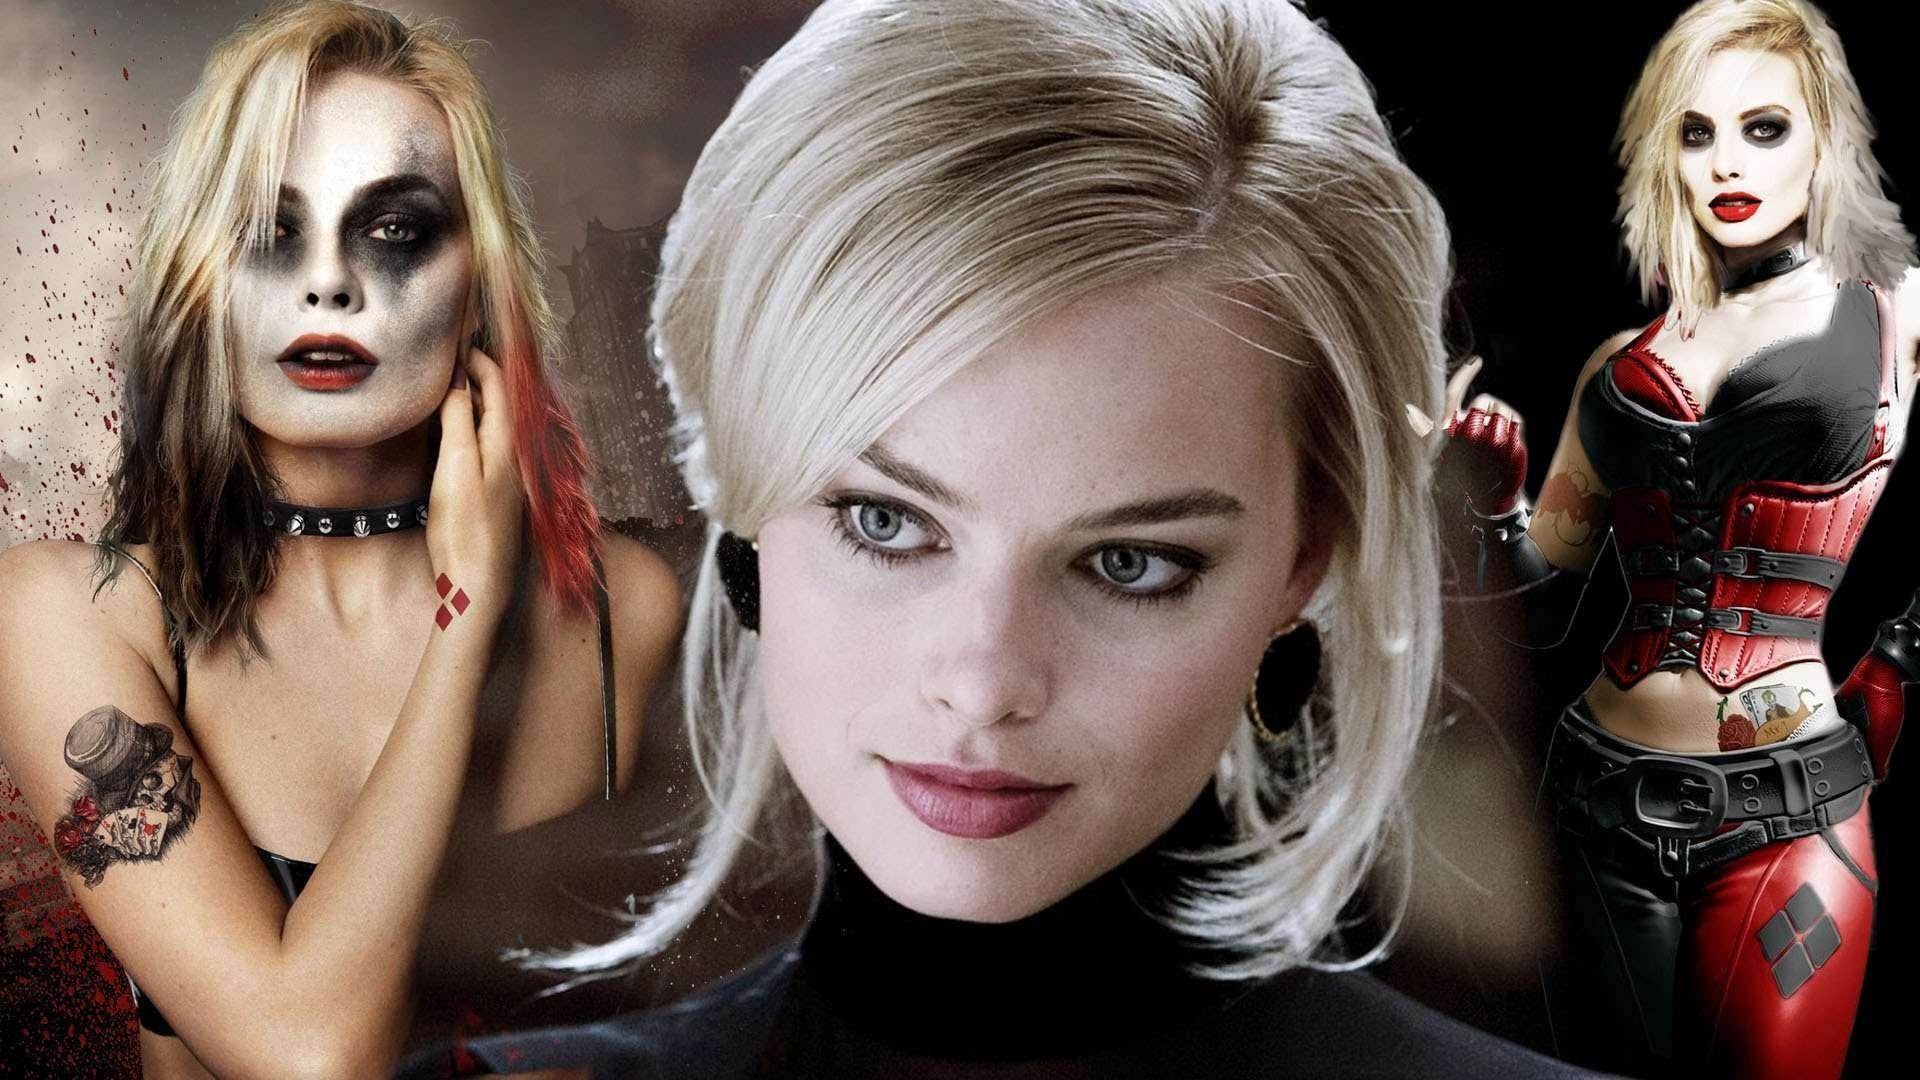 Margot Robbie Harley Quinn Wallpaper Download Free Cool